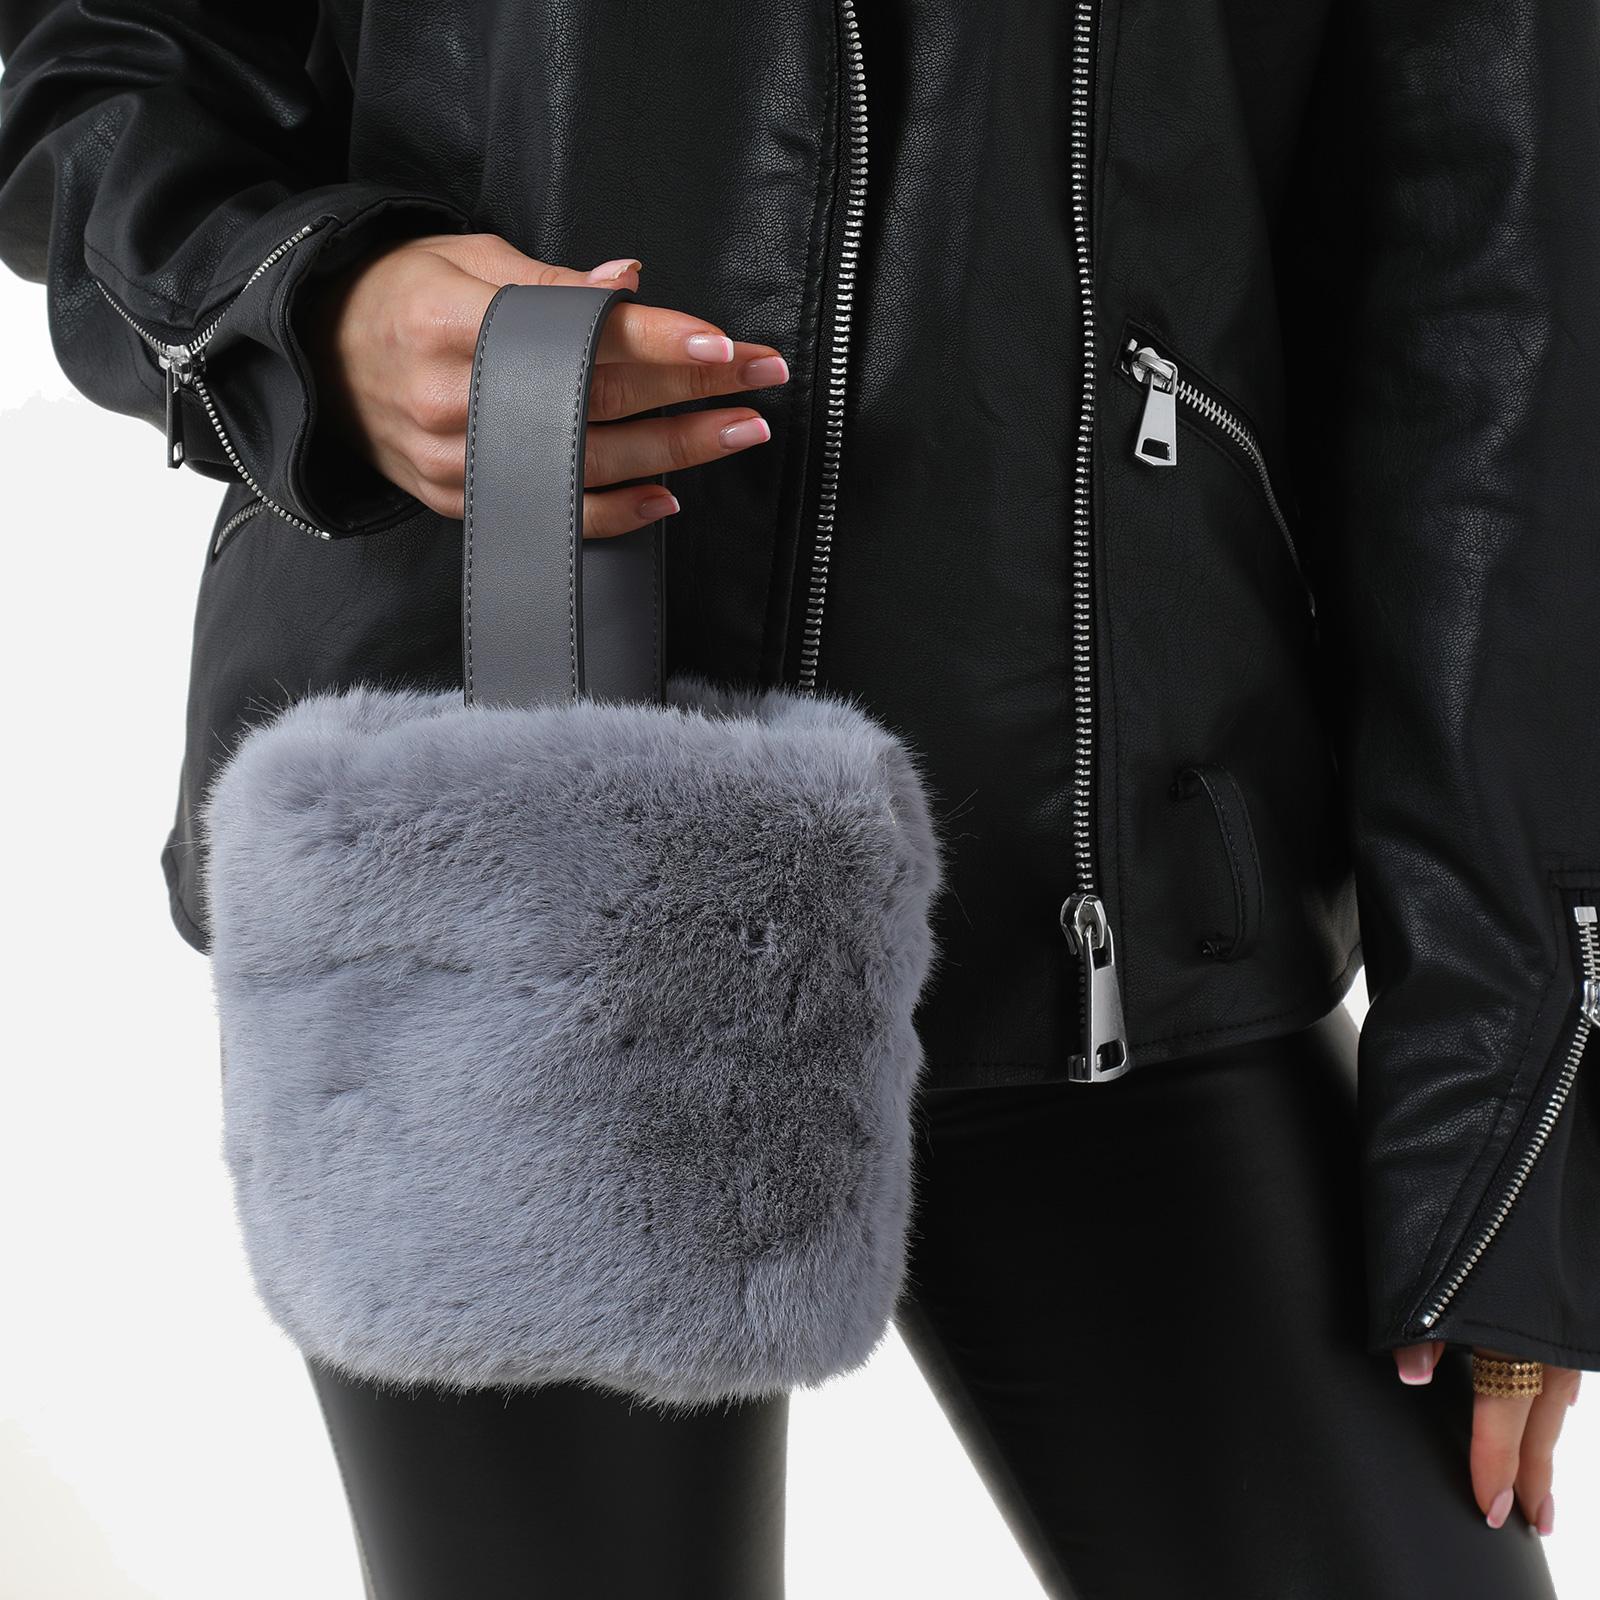 Bucket Bag In Grey Faux Fur